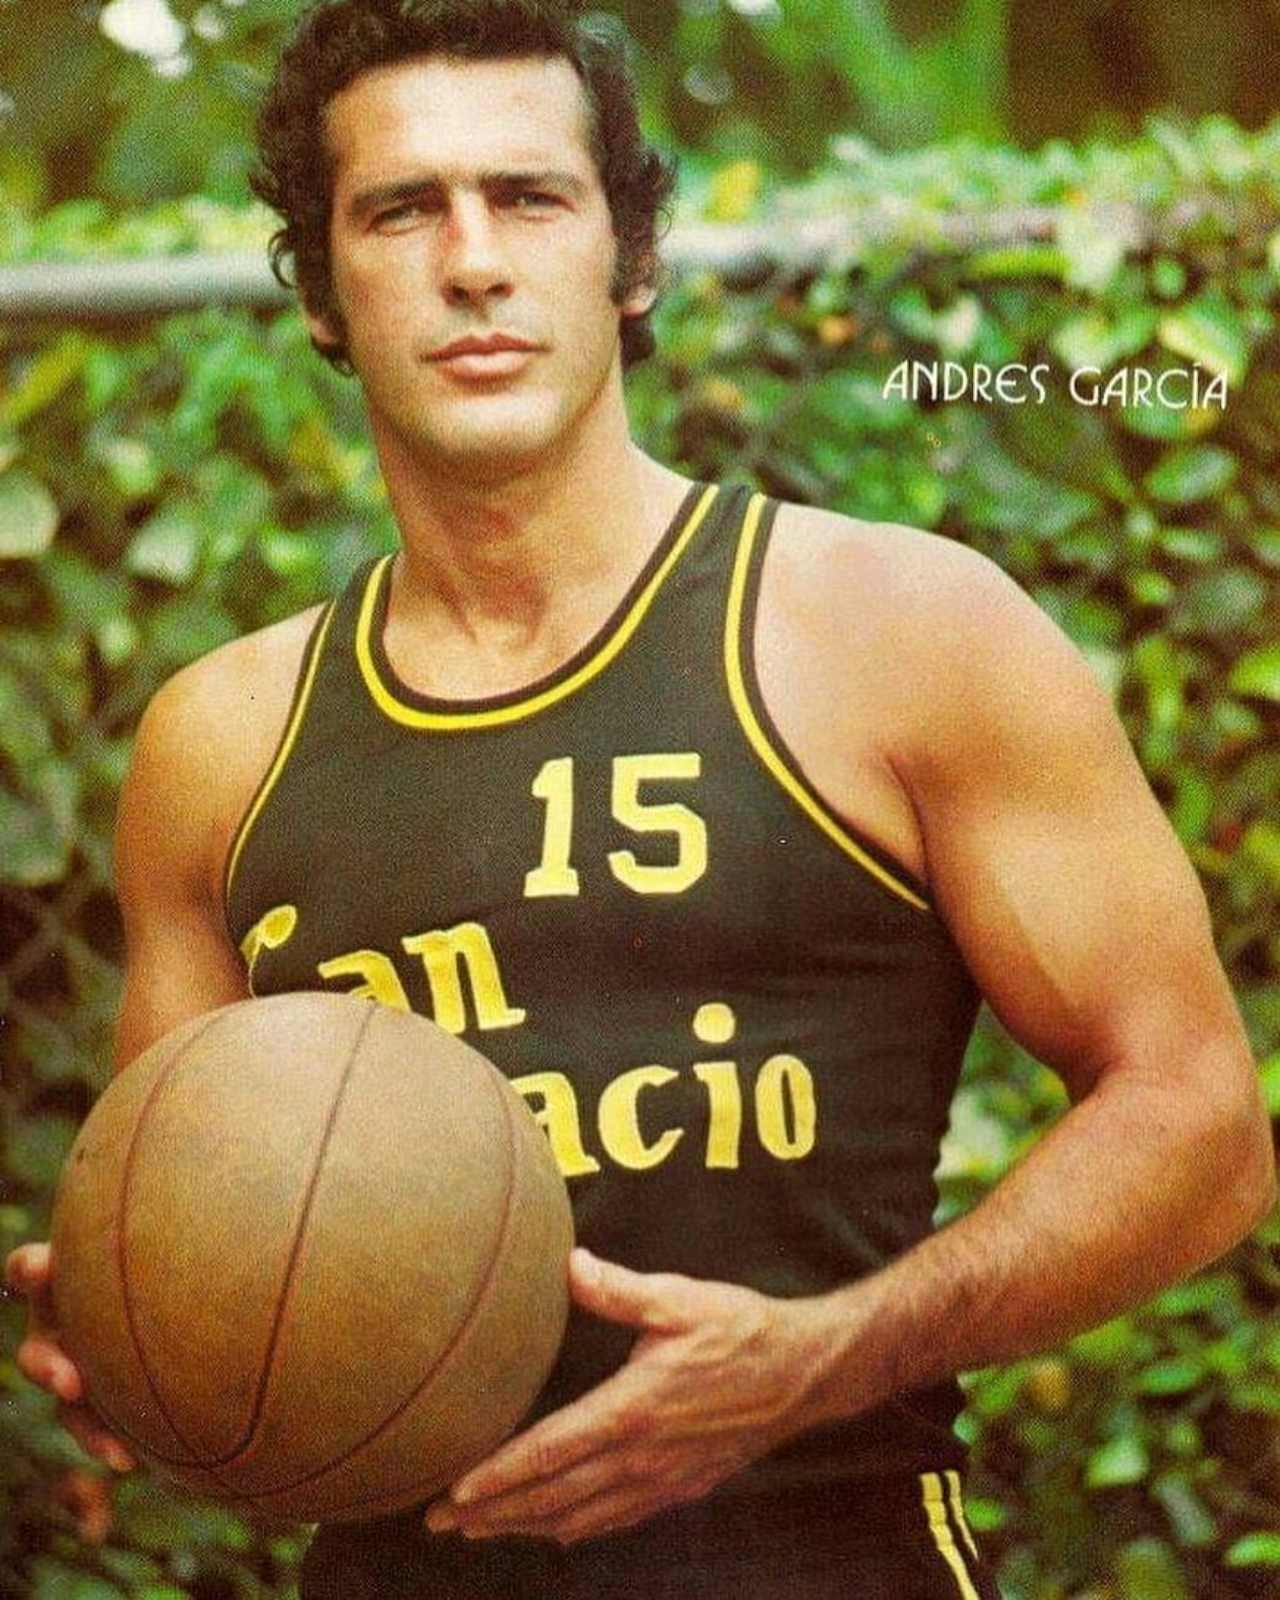 Andres garcia de joven basquetbol